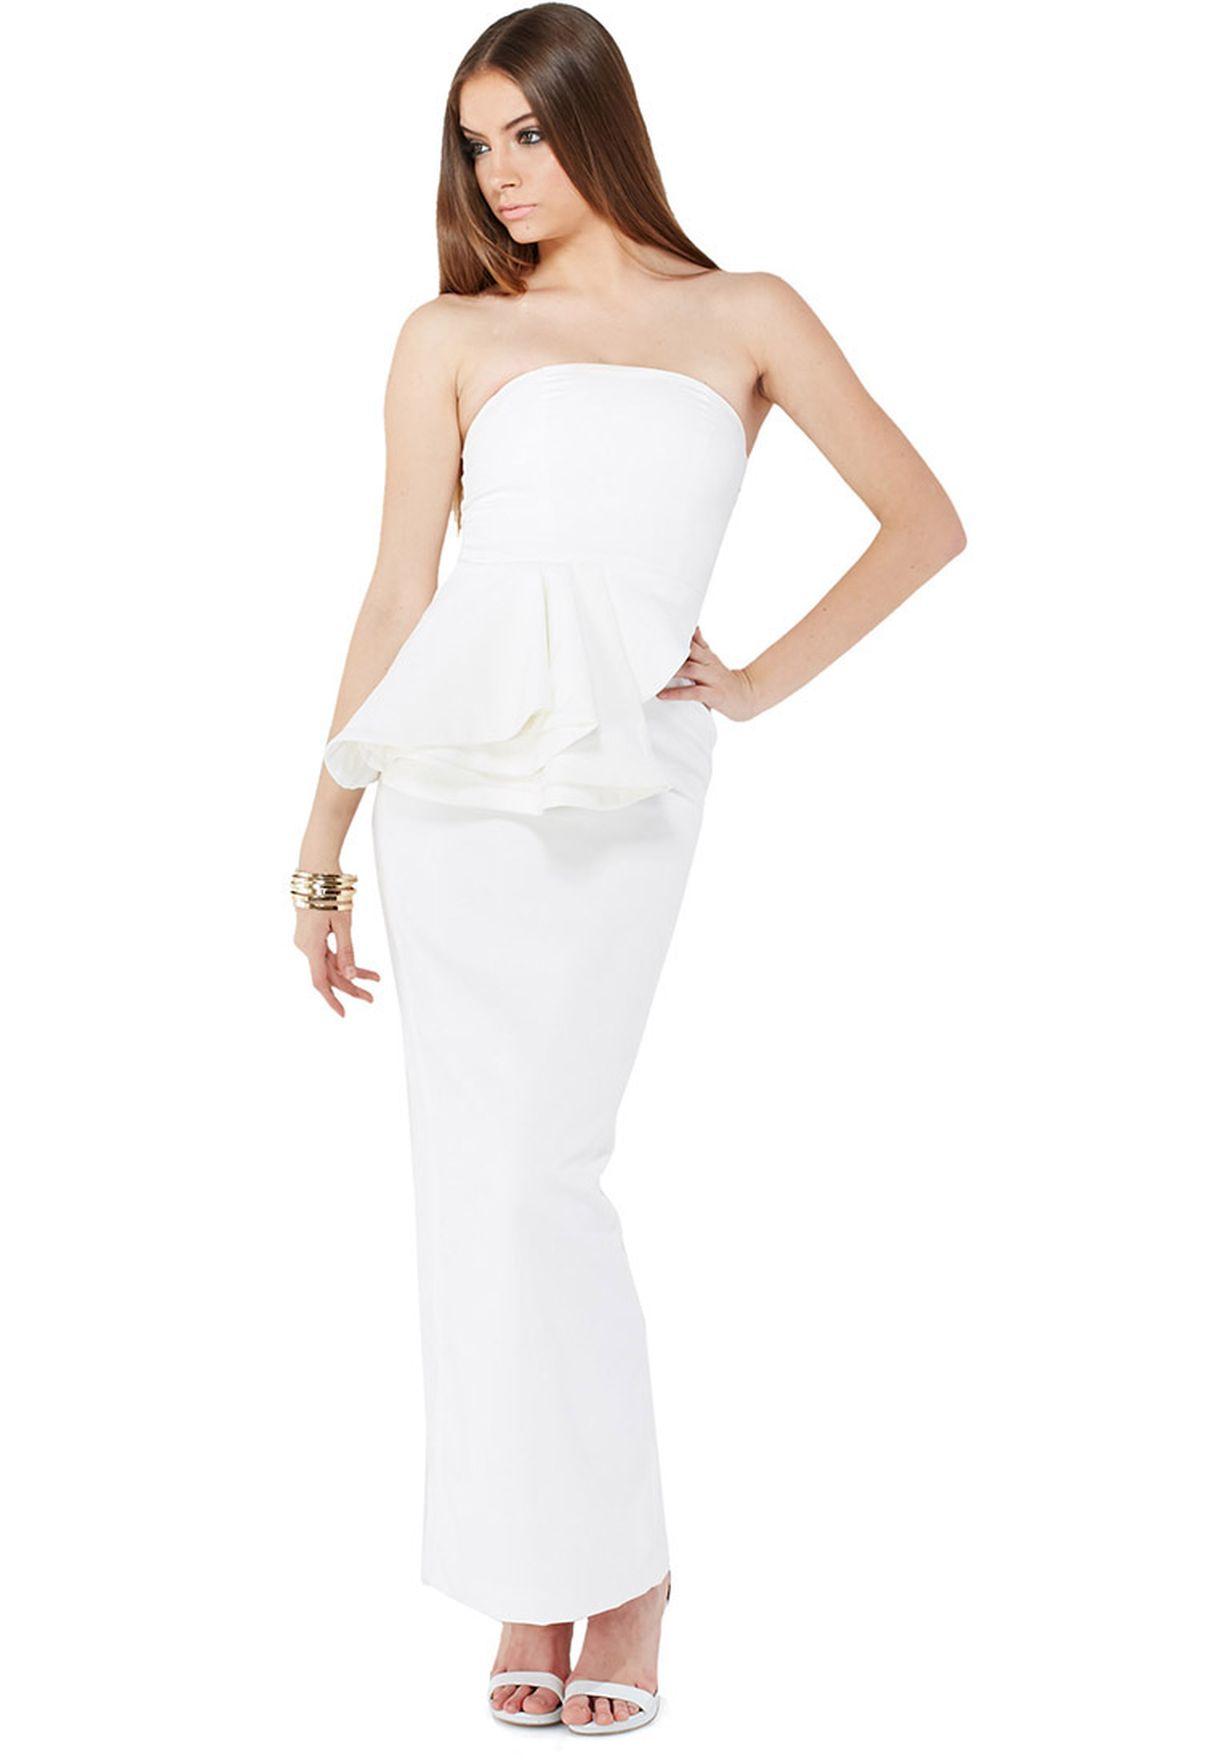 4e8f9eb0eea1 Shop Aqua By Aqua white Sash Structured Peplum Dress for Women in ...